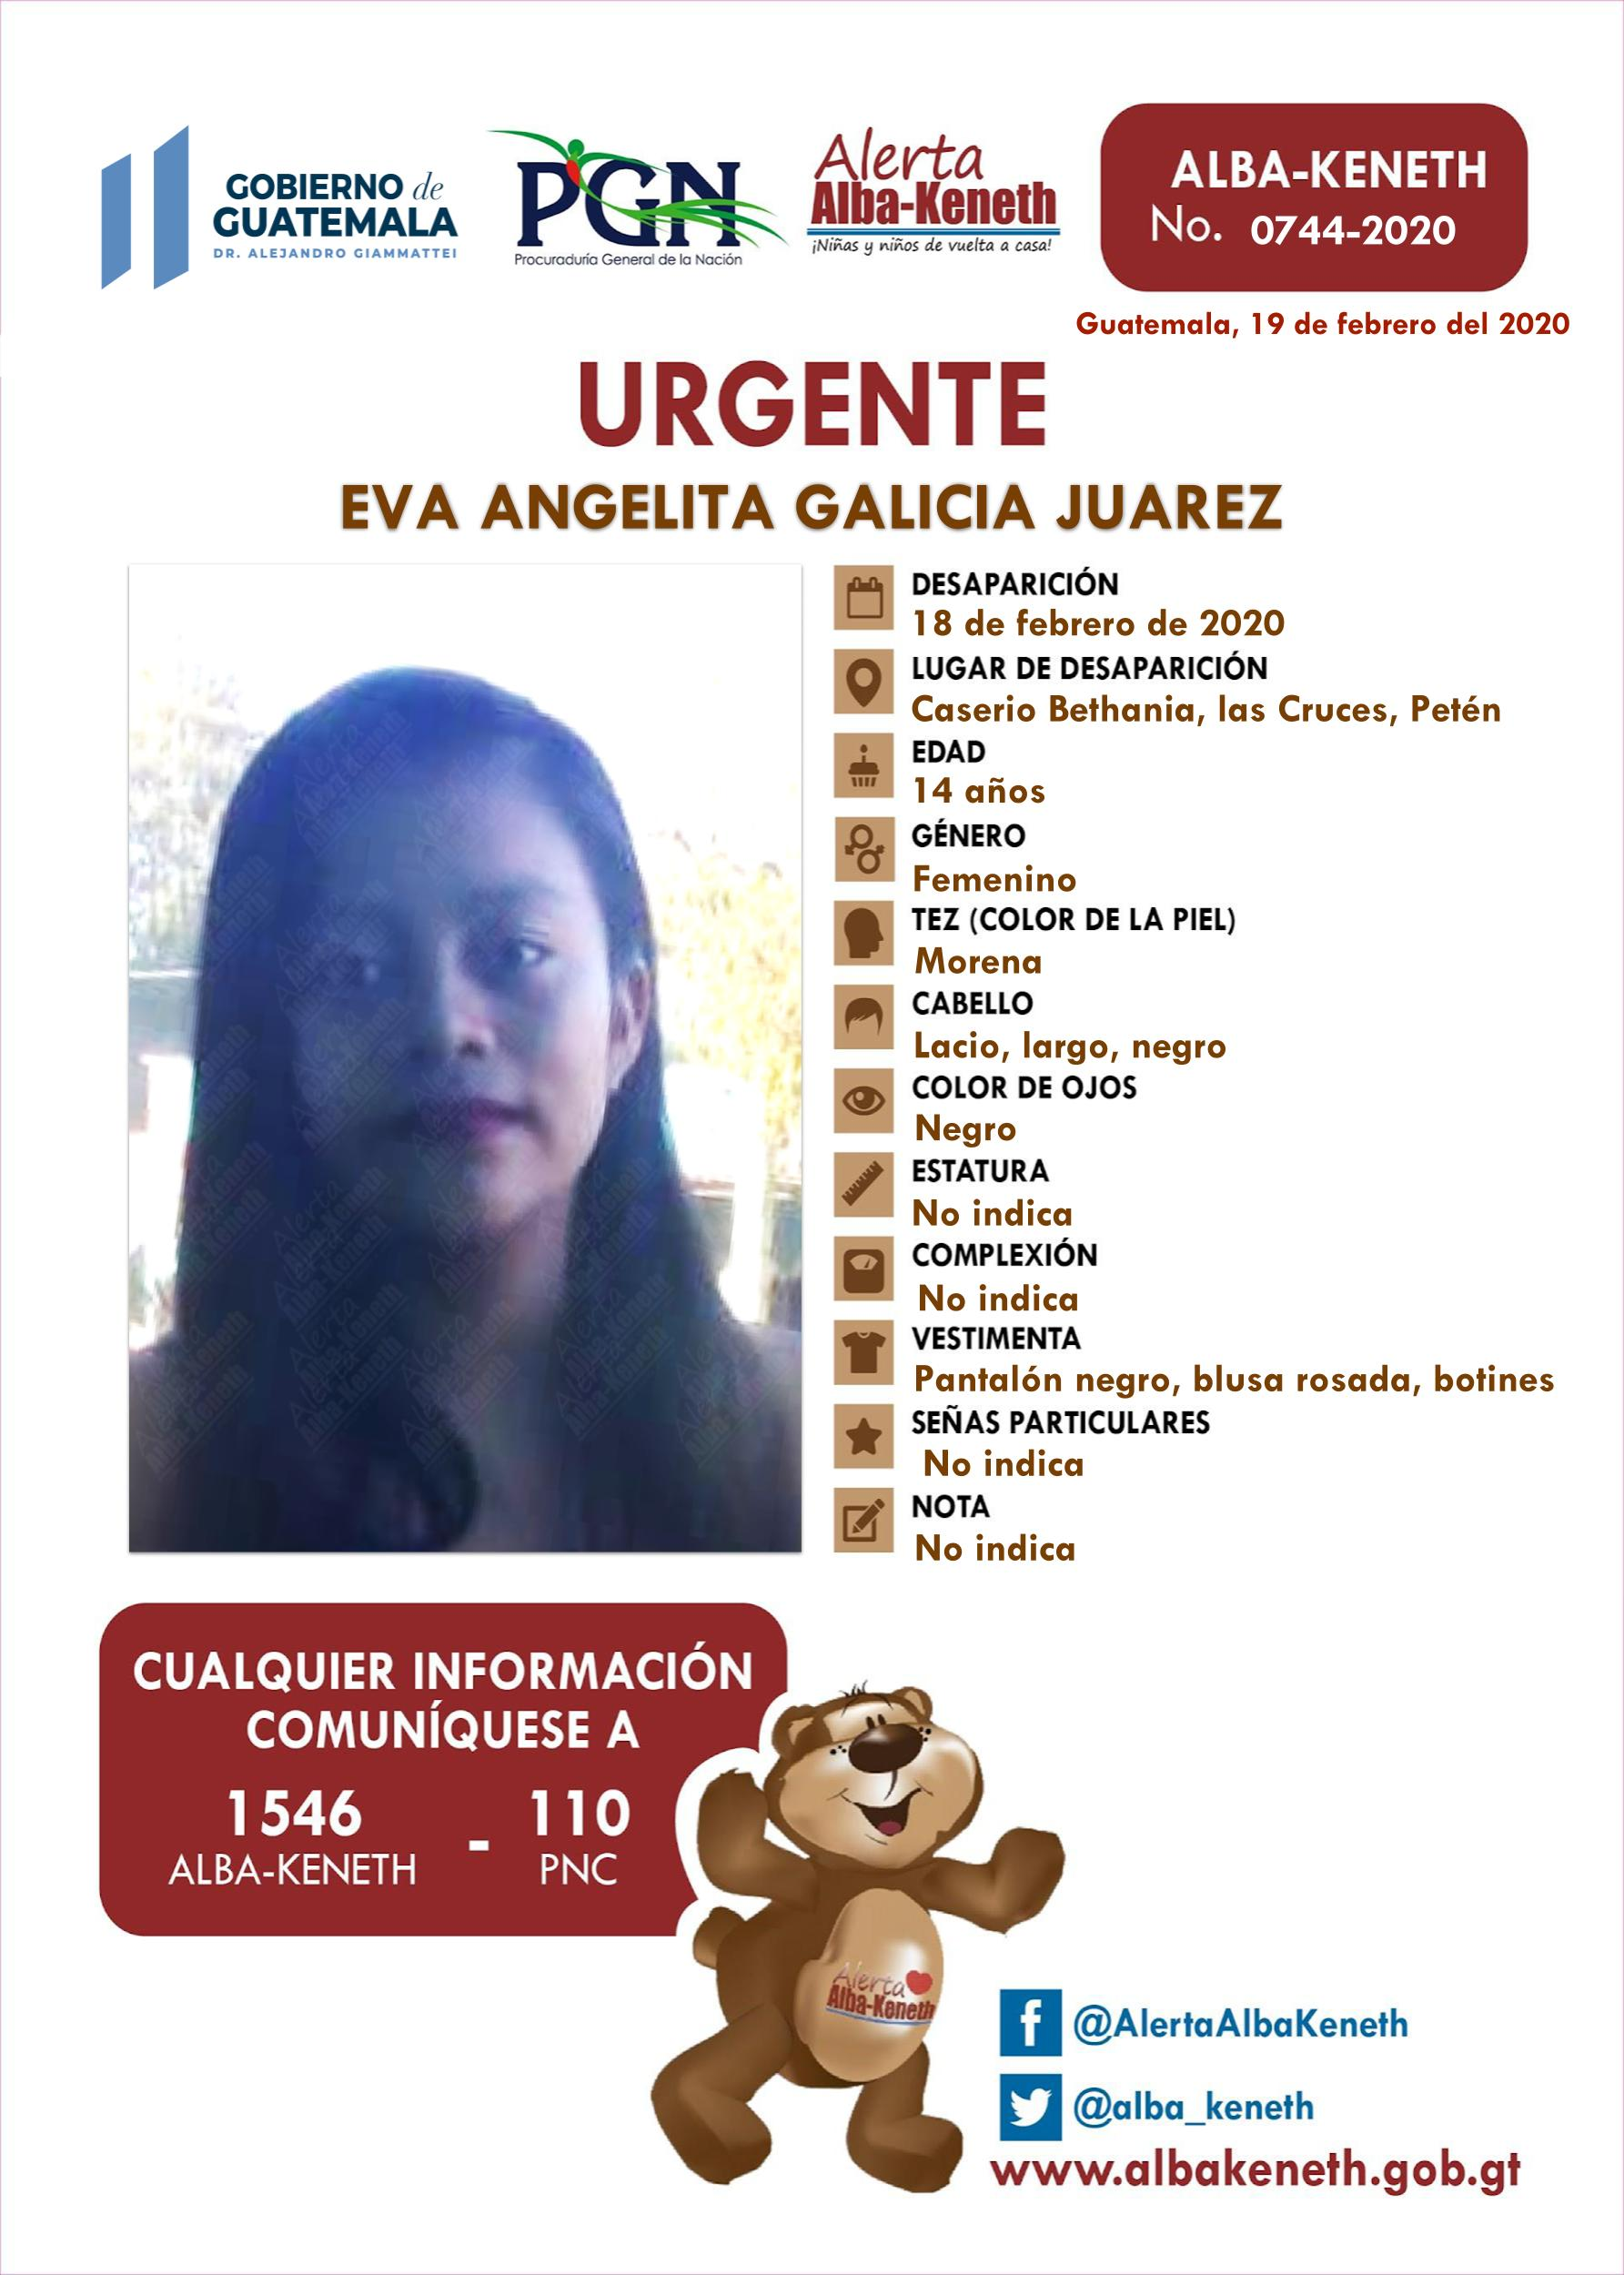 Eva Angelita Galicia Juarez